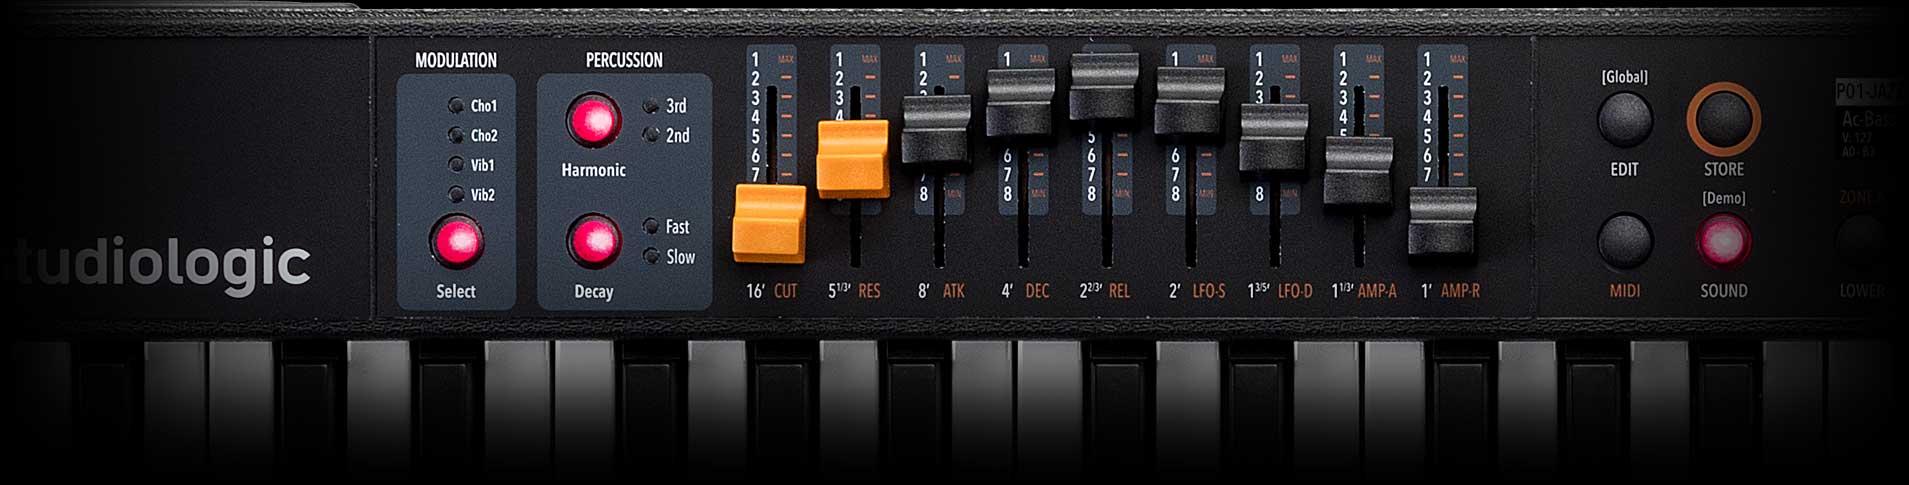 Numa Compact 2x synth and organ drawbars